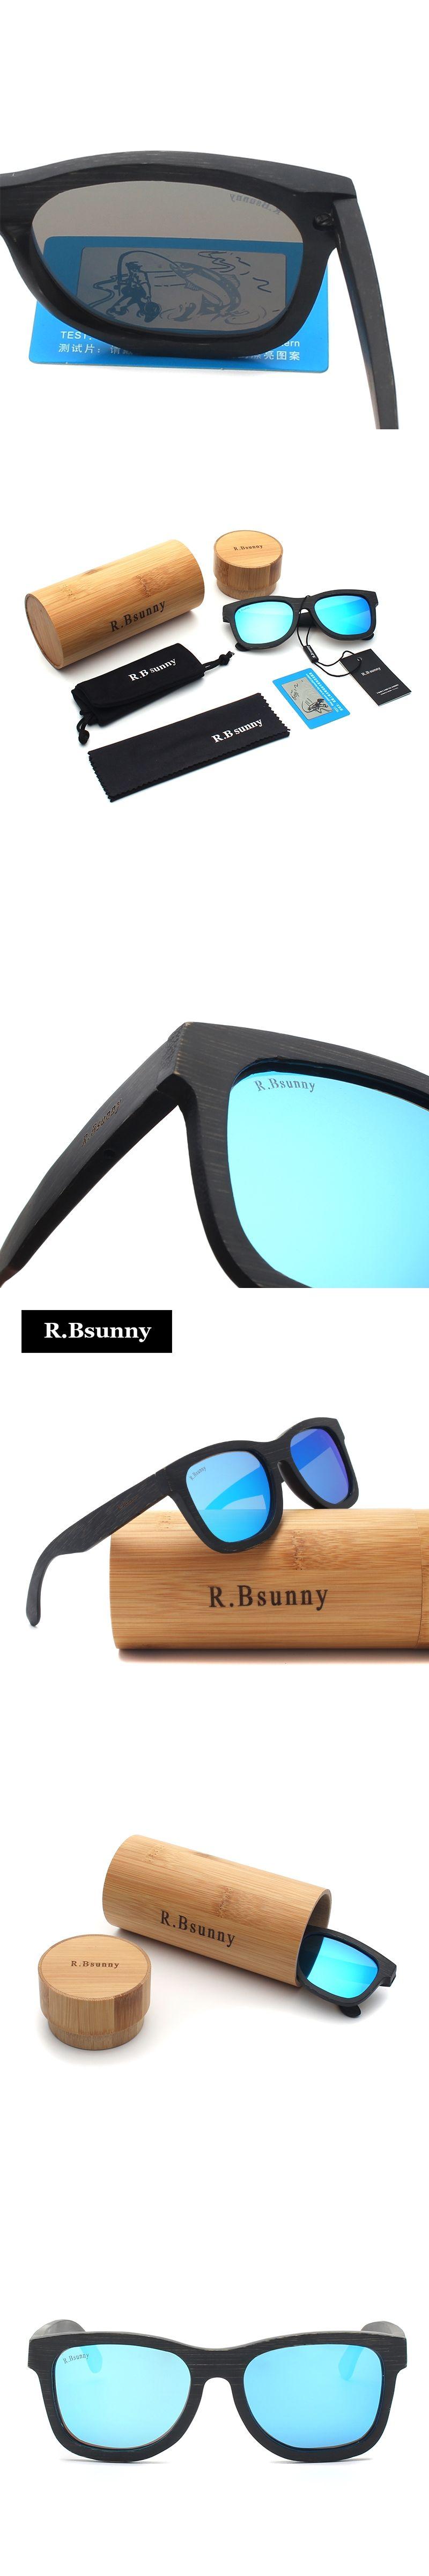 59d1e02e791 R.Bsunny Wooden Sunglasses Polarized Bamboo brand sun glasses Vintage Wood  Case Beach Sunglasses for